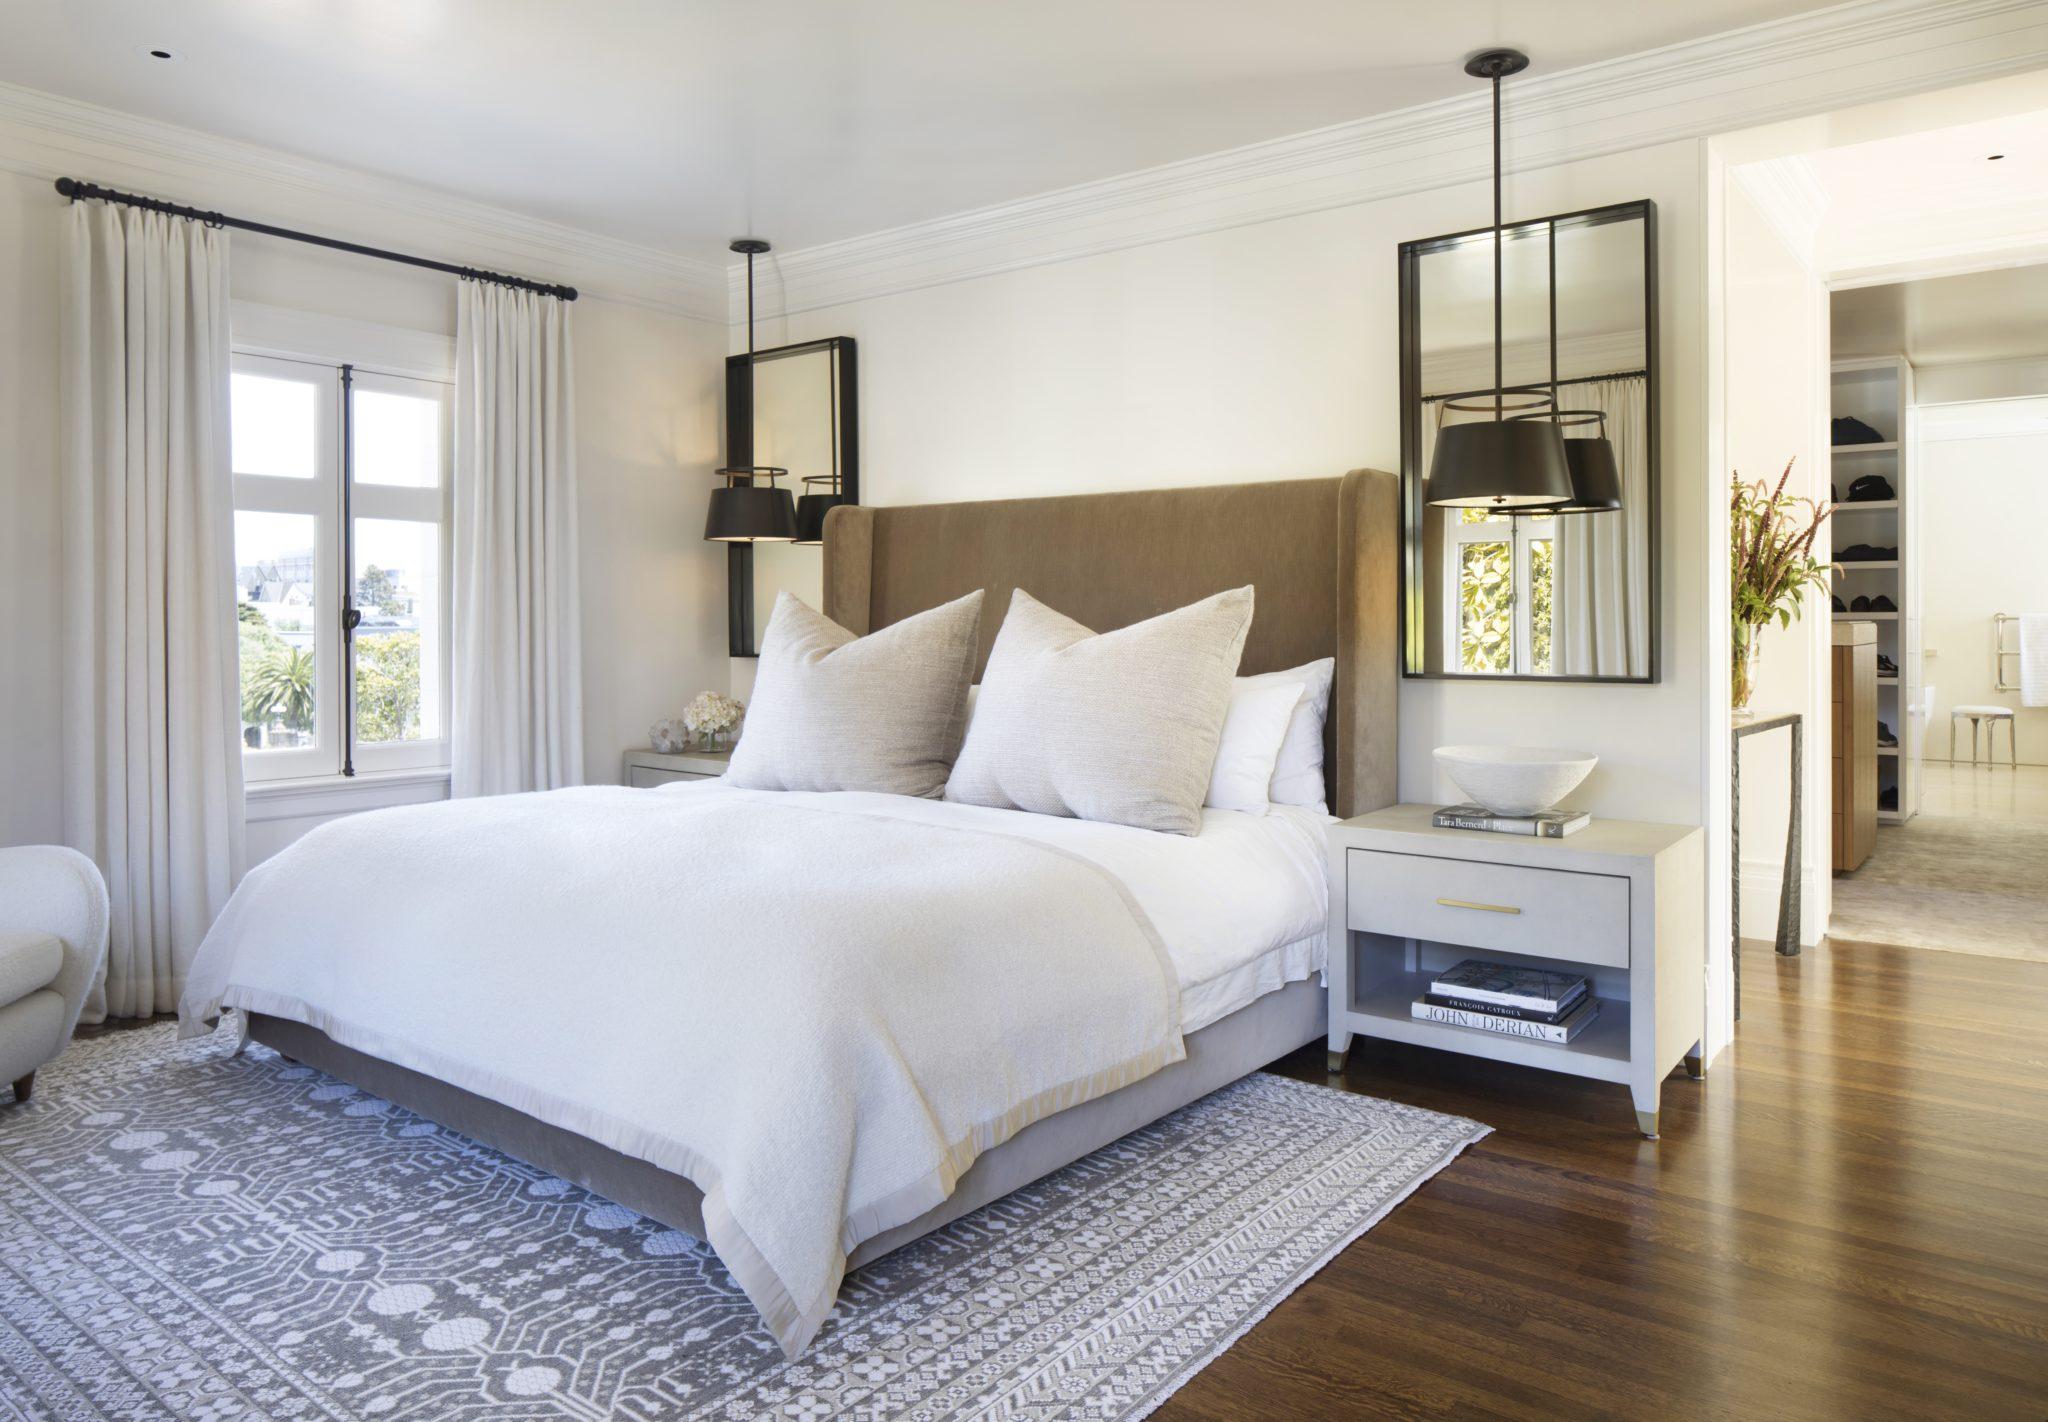 8 Bedrooms with Bedside Pendant Lighting - Chairish Blog